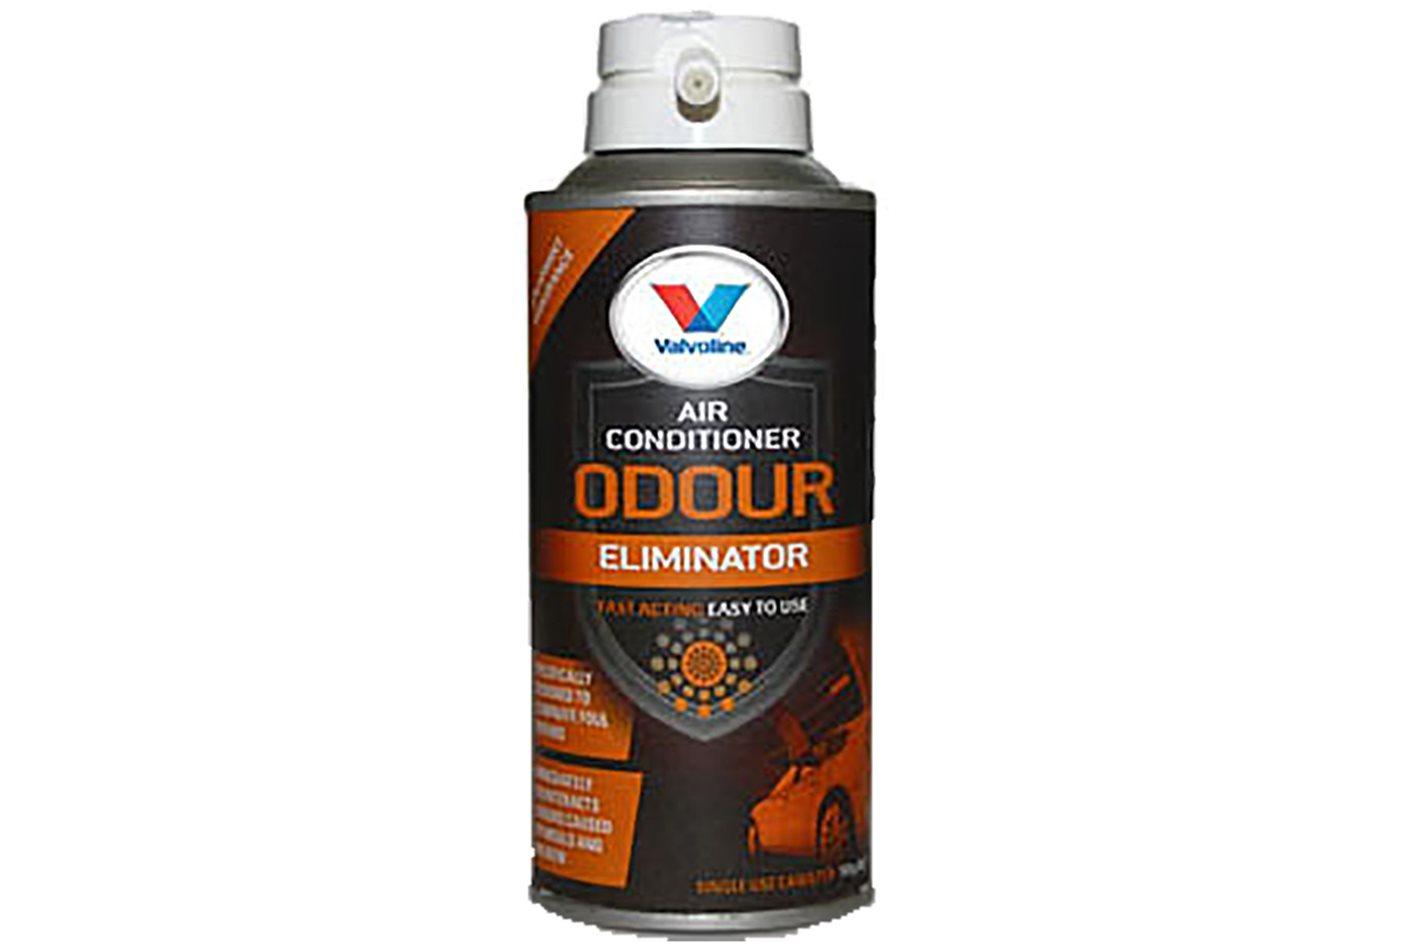 Valvoline odour eliminator